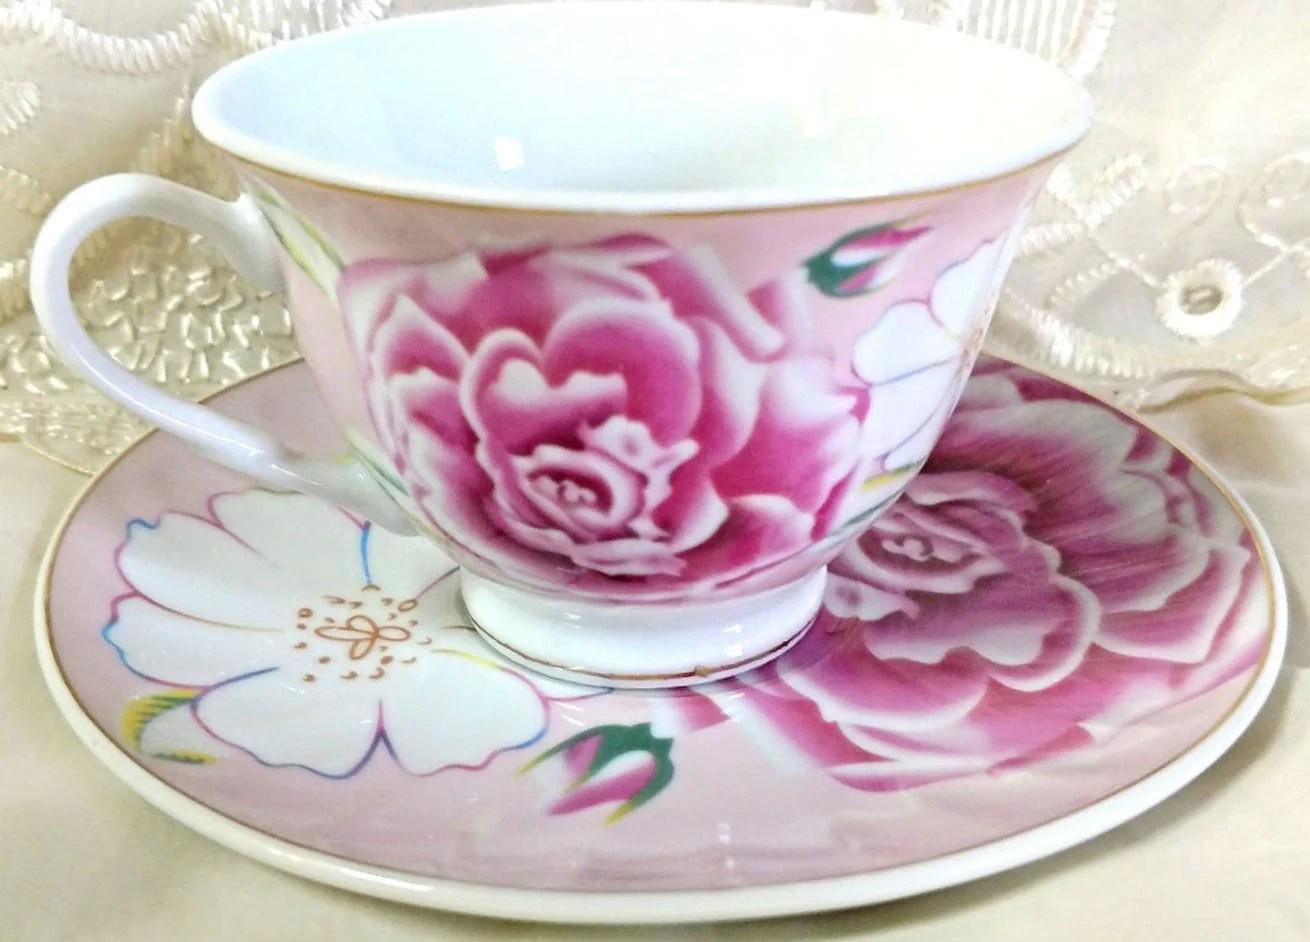 Inspiring Saucer Bulk Wholesale Teacups Pink Morning Wholesale Tea Cup Saucers Cheap Price Free Shipping Heart Shaped Tea Cup Set furniture Heart Shaped Tea Set